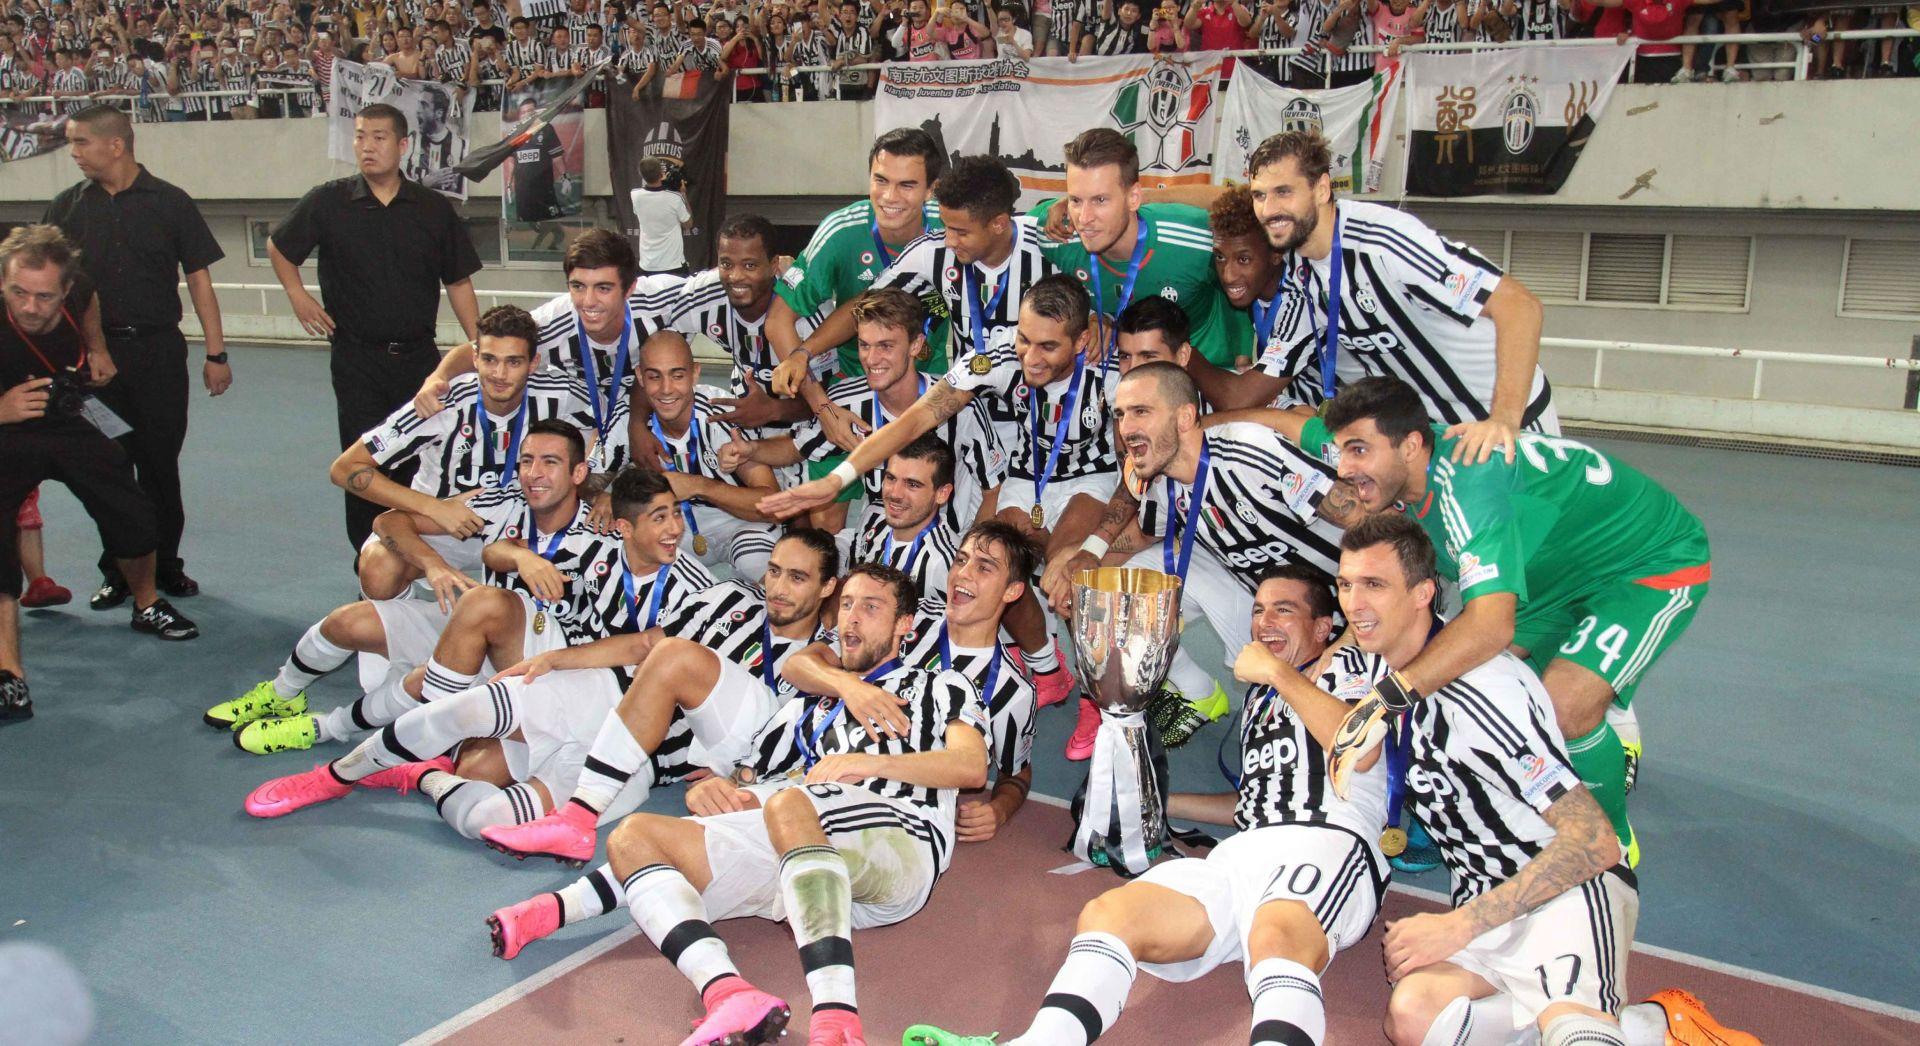 FOTO: Znate li koliko je Juventusovih igrača na posudbi ove sezone?